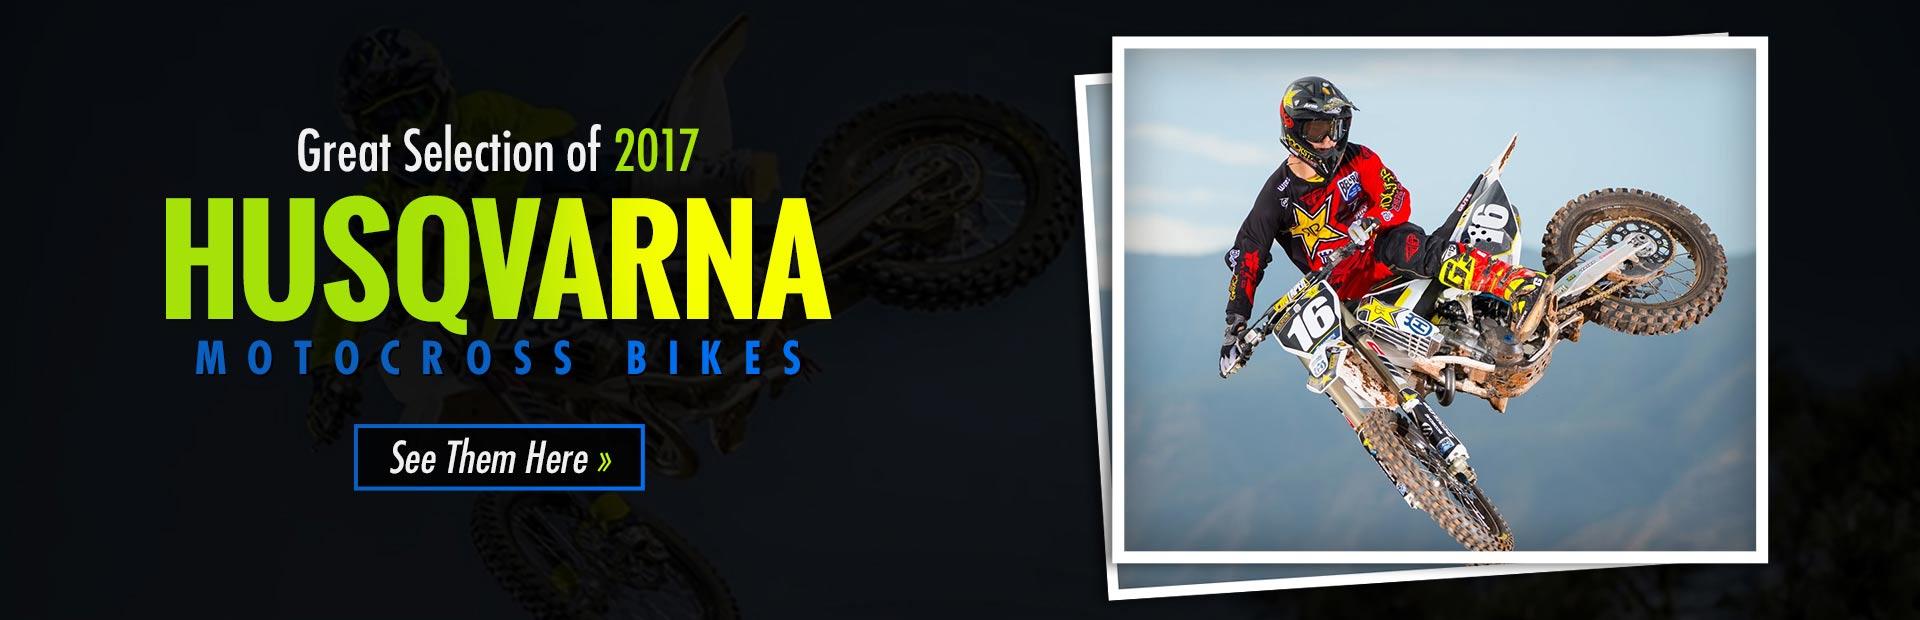 2017 Husqvarna Motocross Bikes: Click here to view the models.